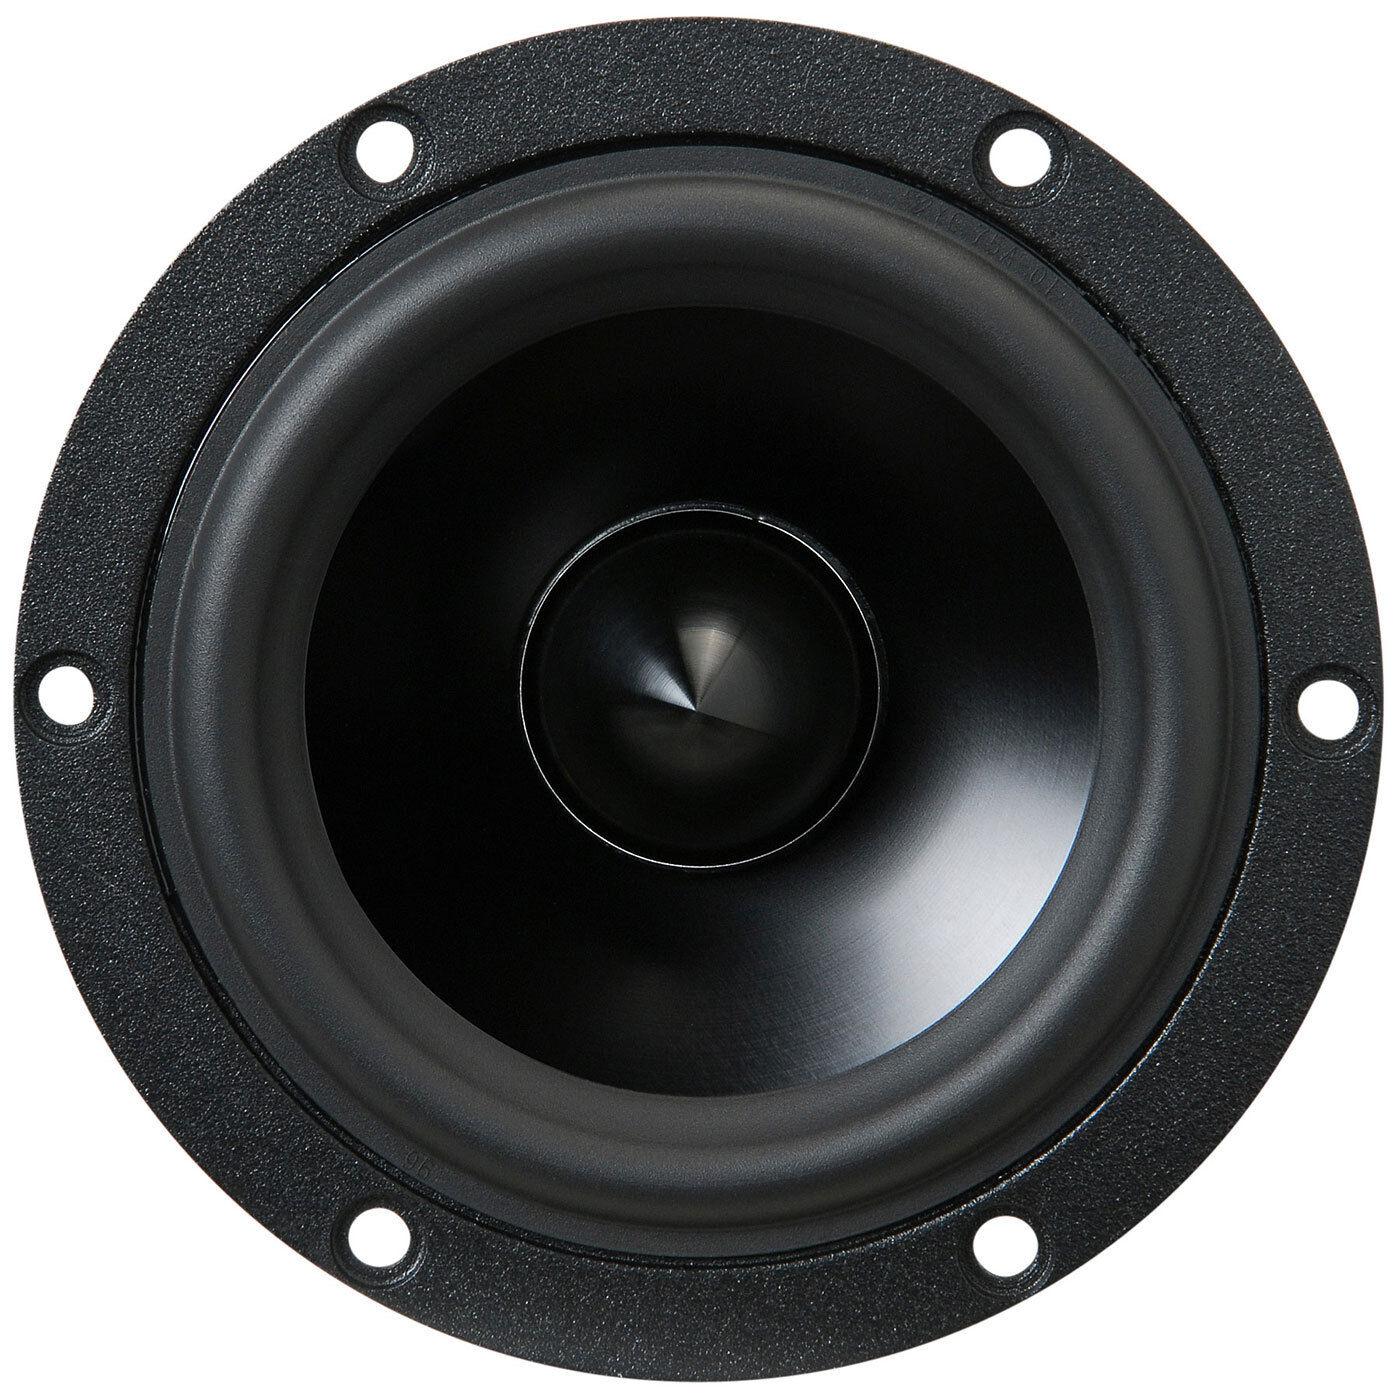 "Dayton Audio RS100-4 4"" Reference Full-Range Driver 4 Ohm ..."